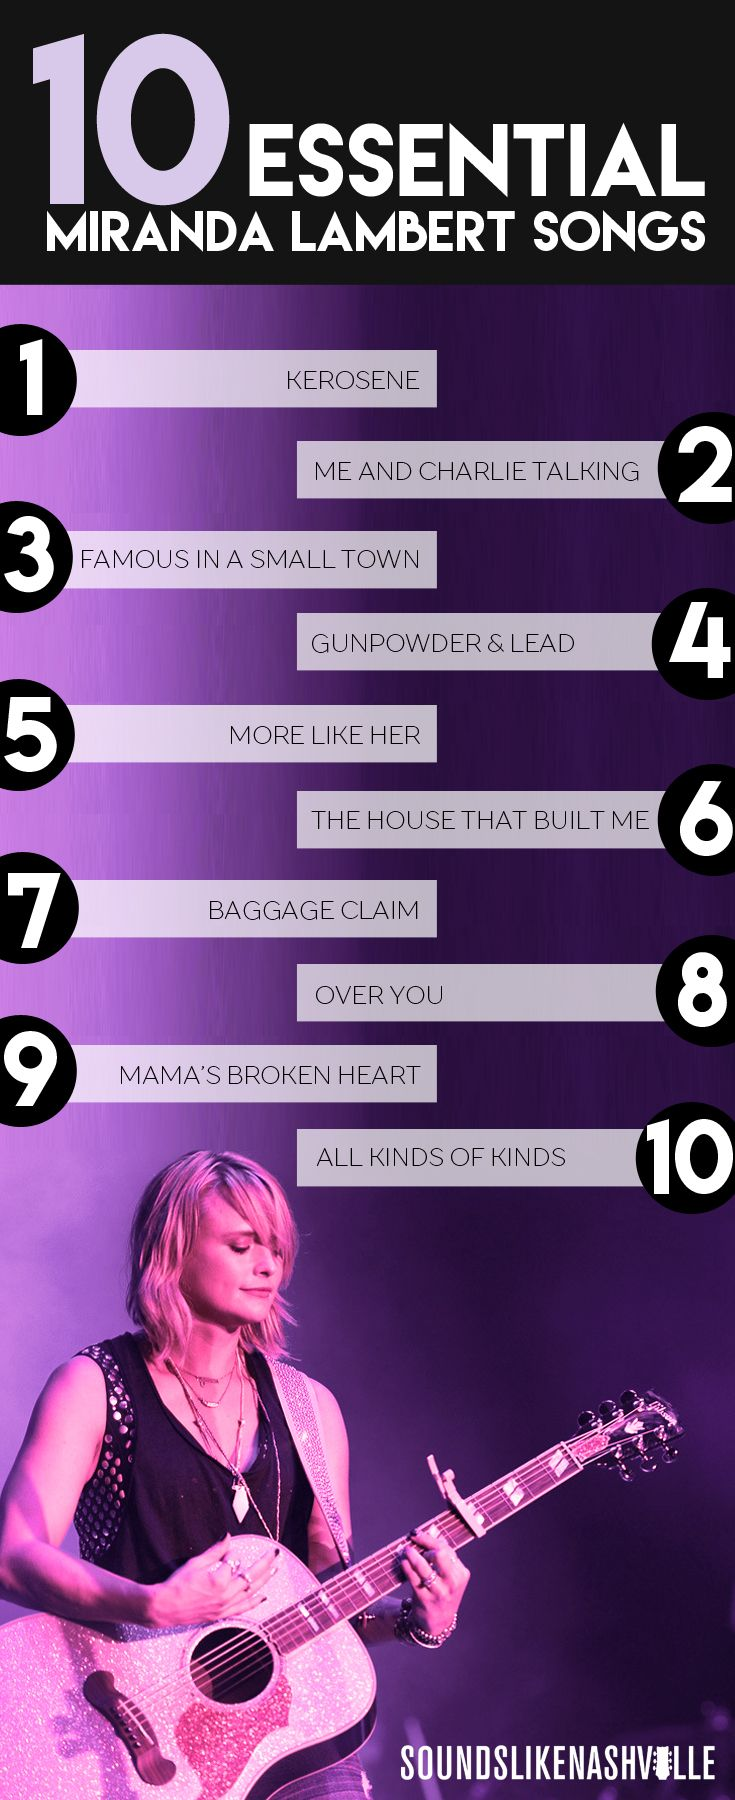 10 Essential Miranda Lambert Songs